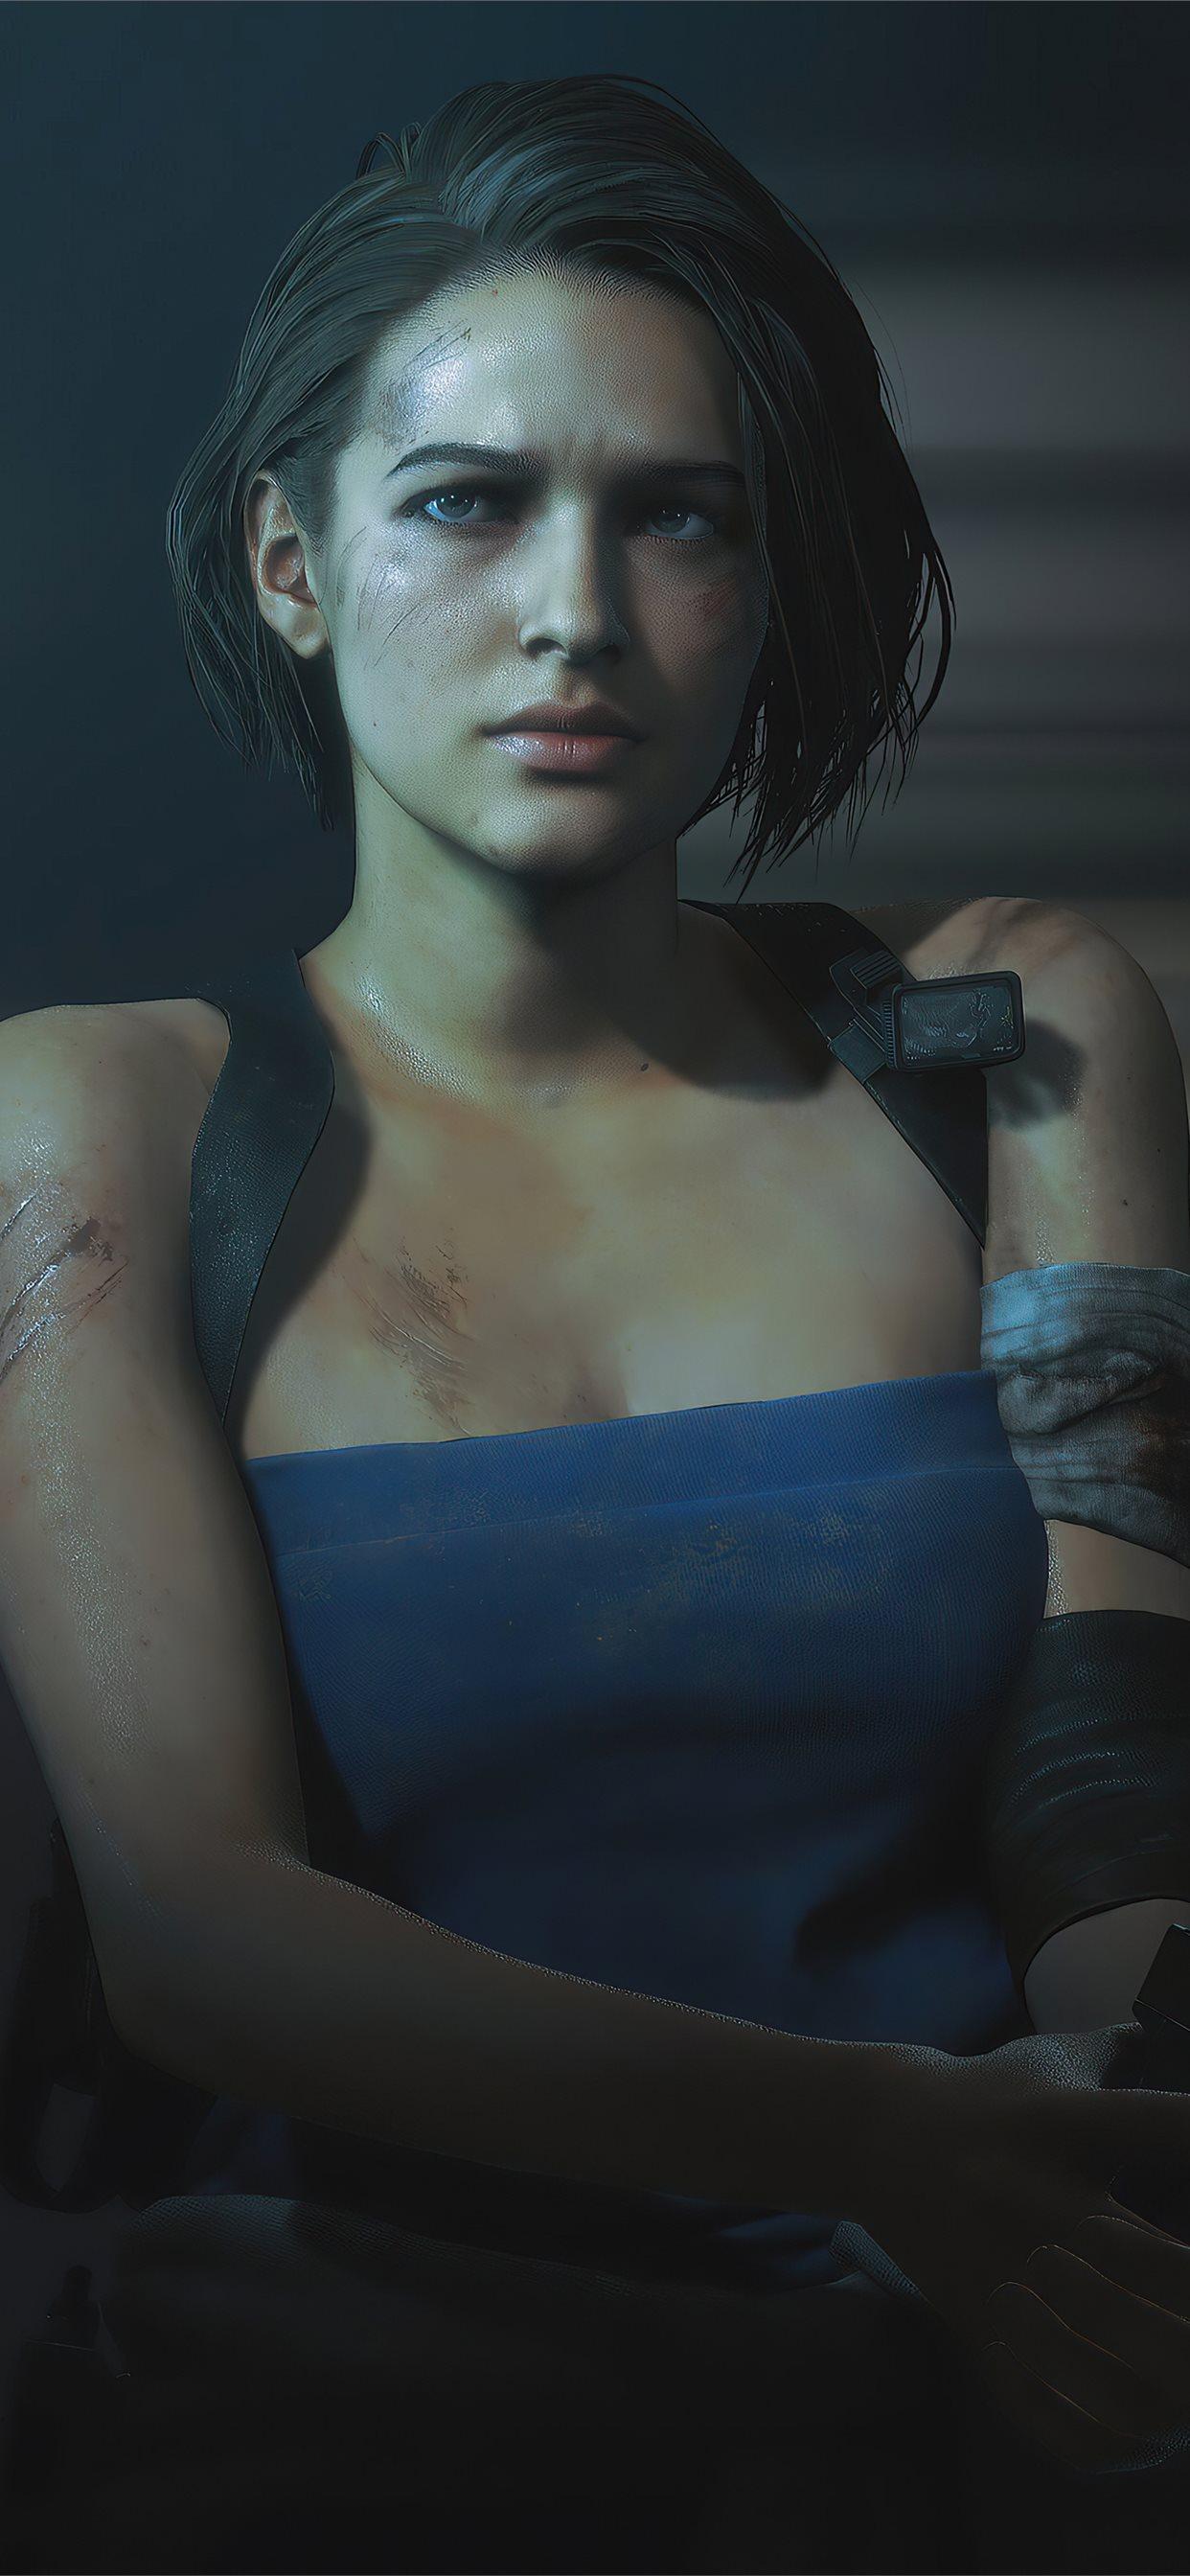 V For Valentine Resident Evil 3 Remake 4k Iphone X Wallpapers Free